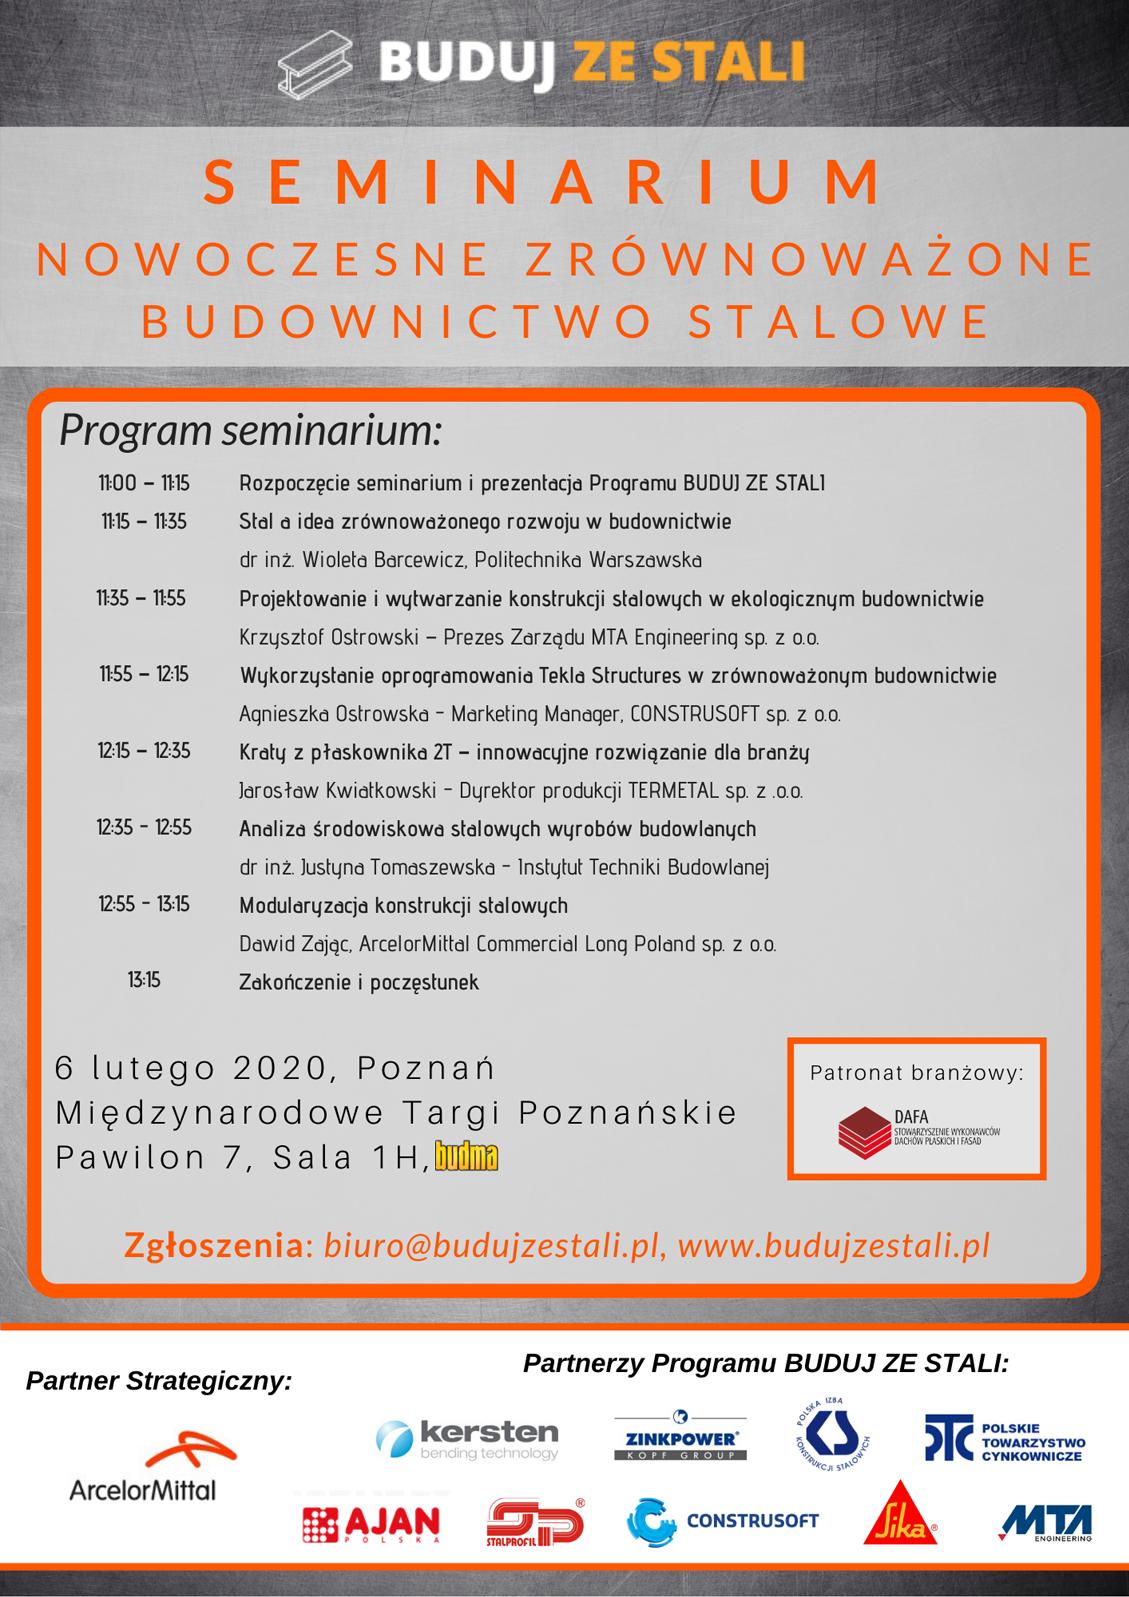 Seminarium BUDUJ ZE STALI - 6.02.2020 R.